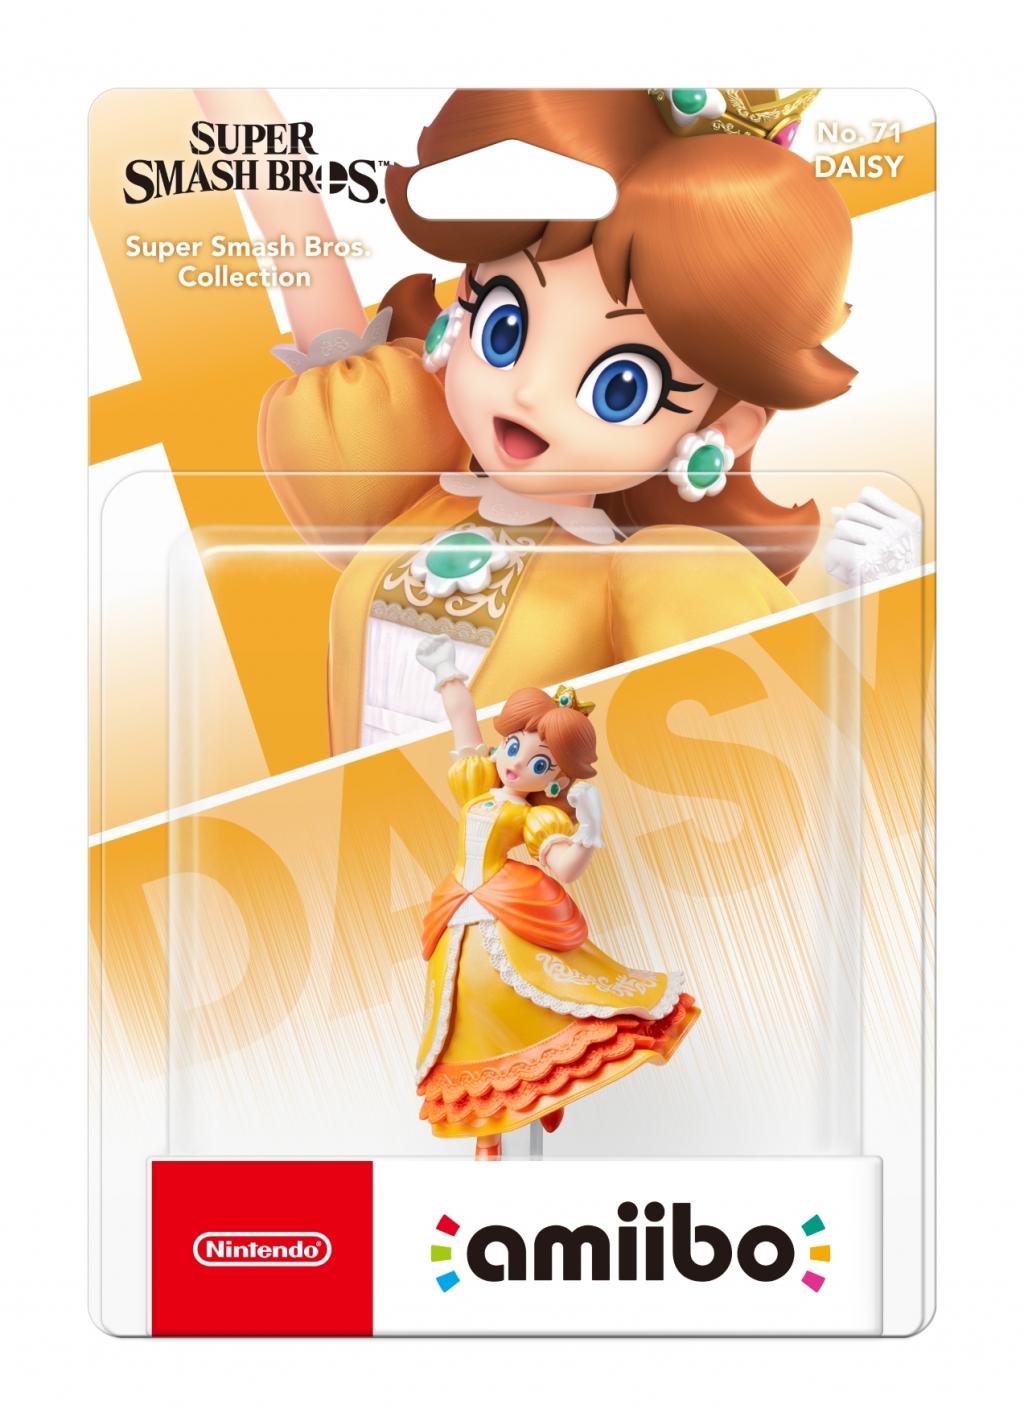 ФигуркаAmiiboДейзи(коллекцияSuperSmashBros.)для Nintendo